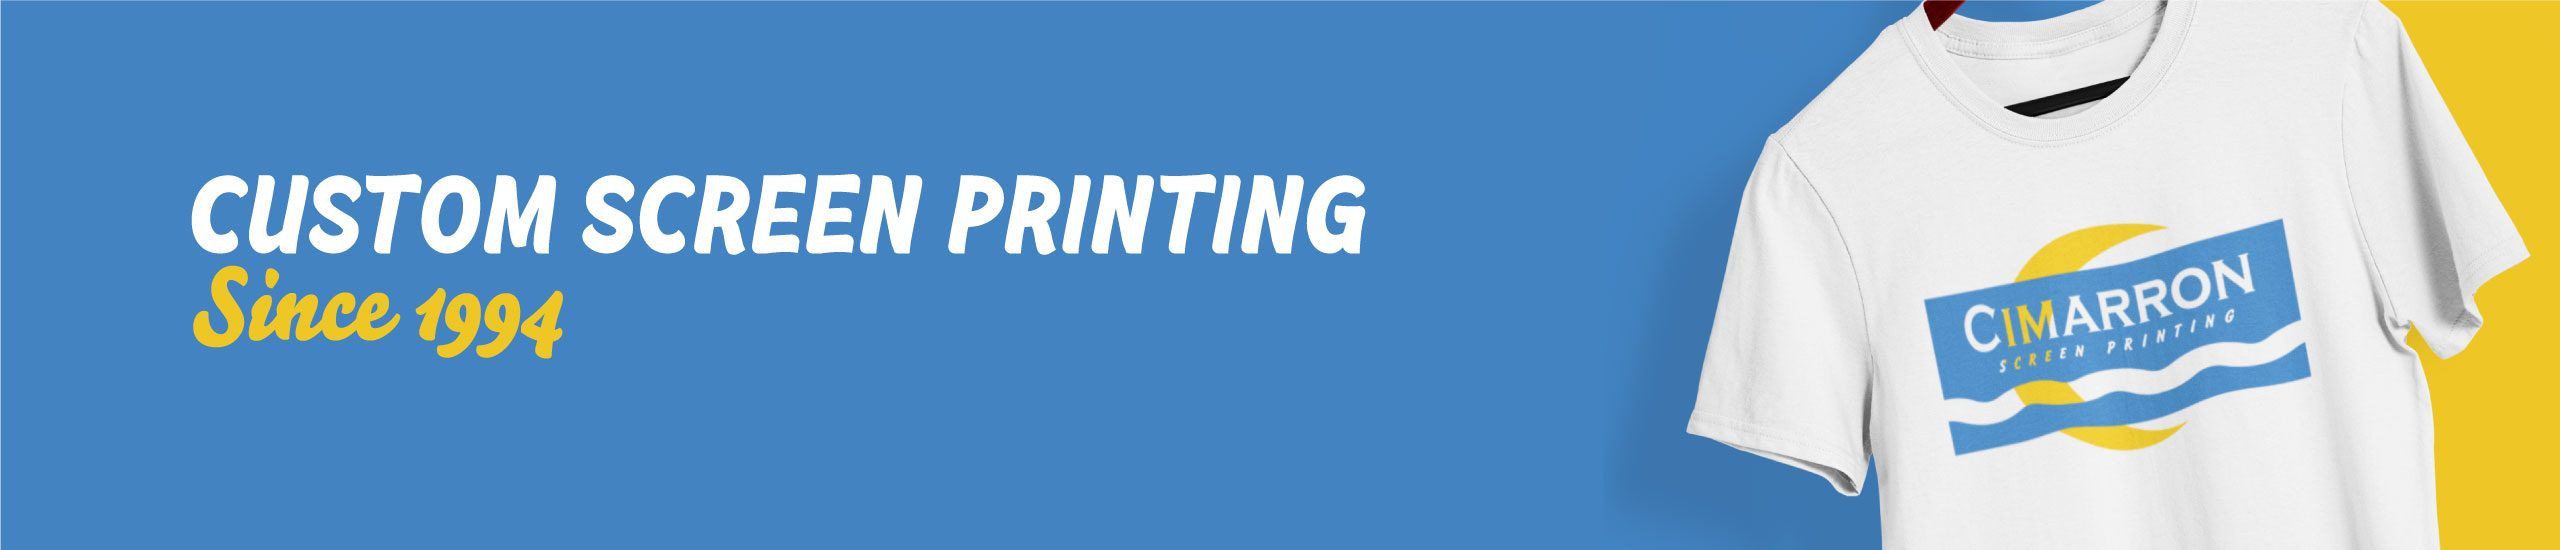 Cimarron Screen Printing